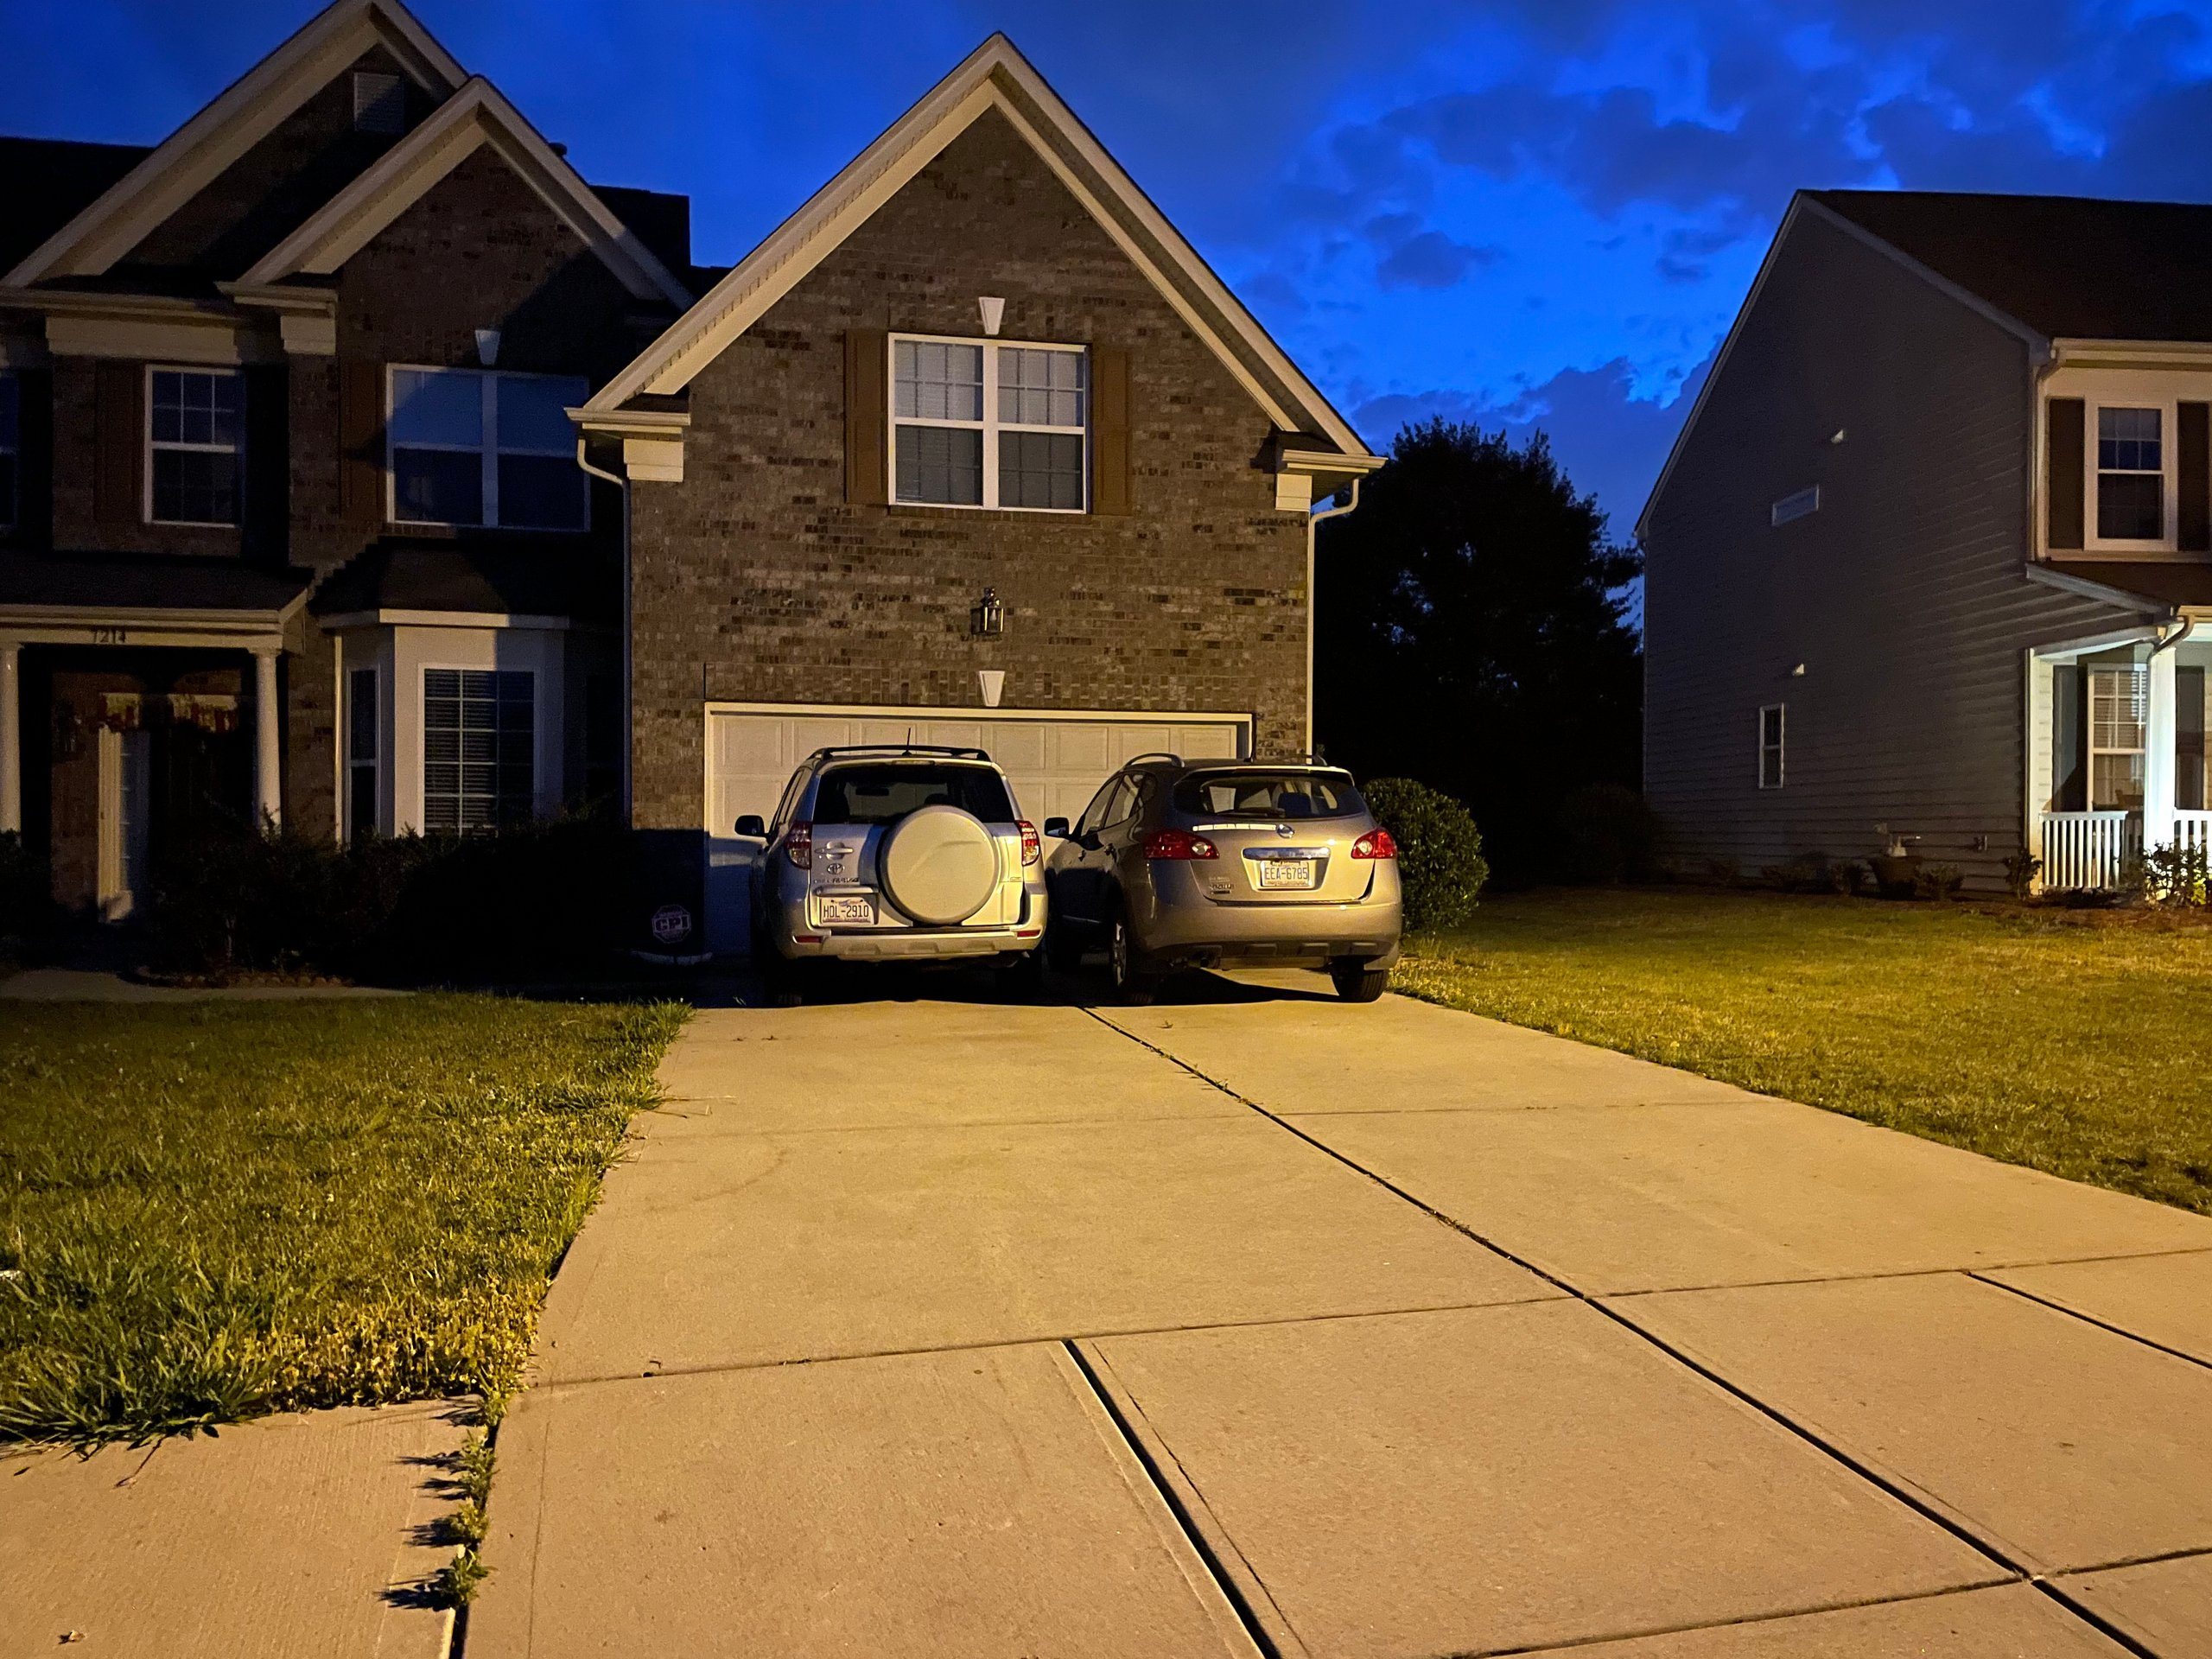 20x16 Parking Lot self storage unit